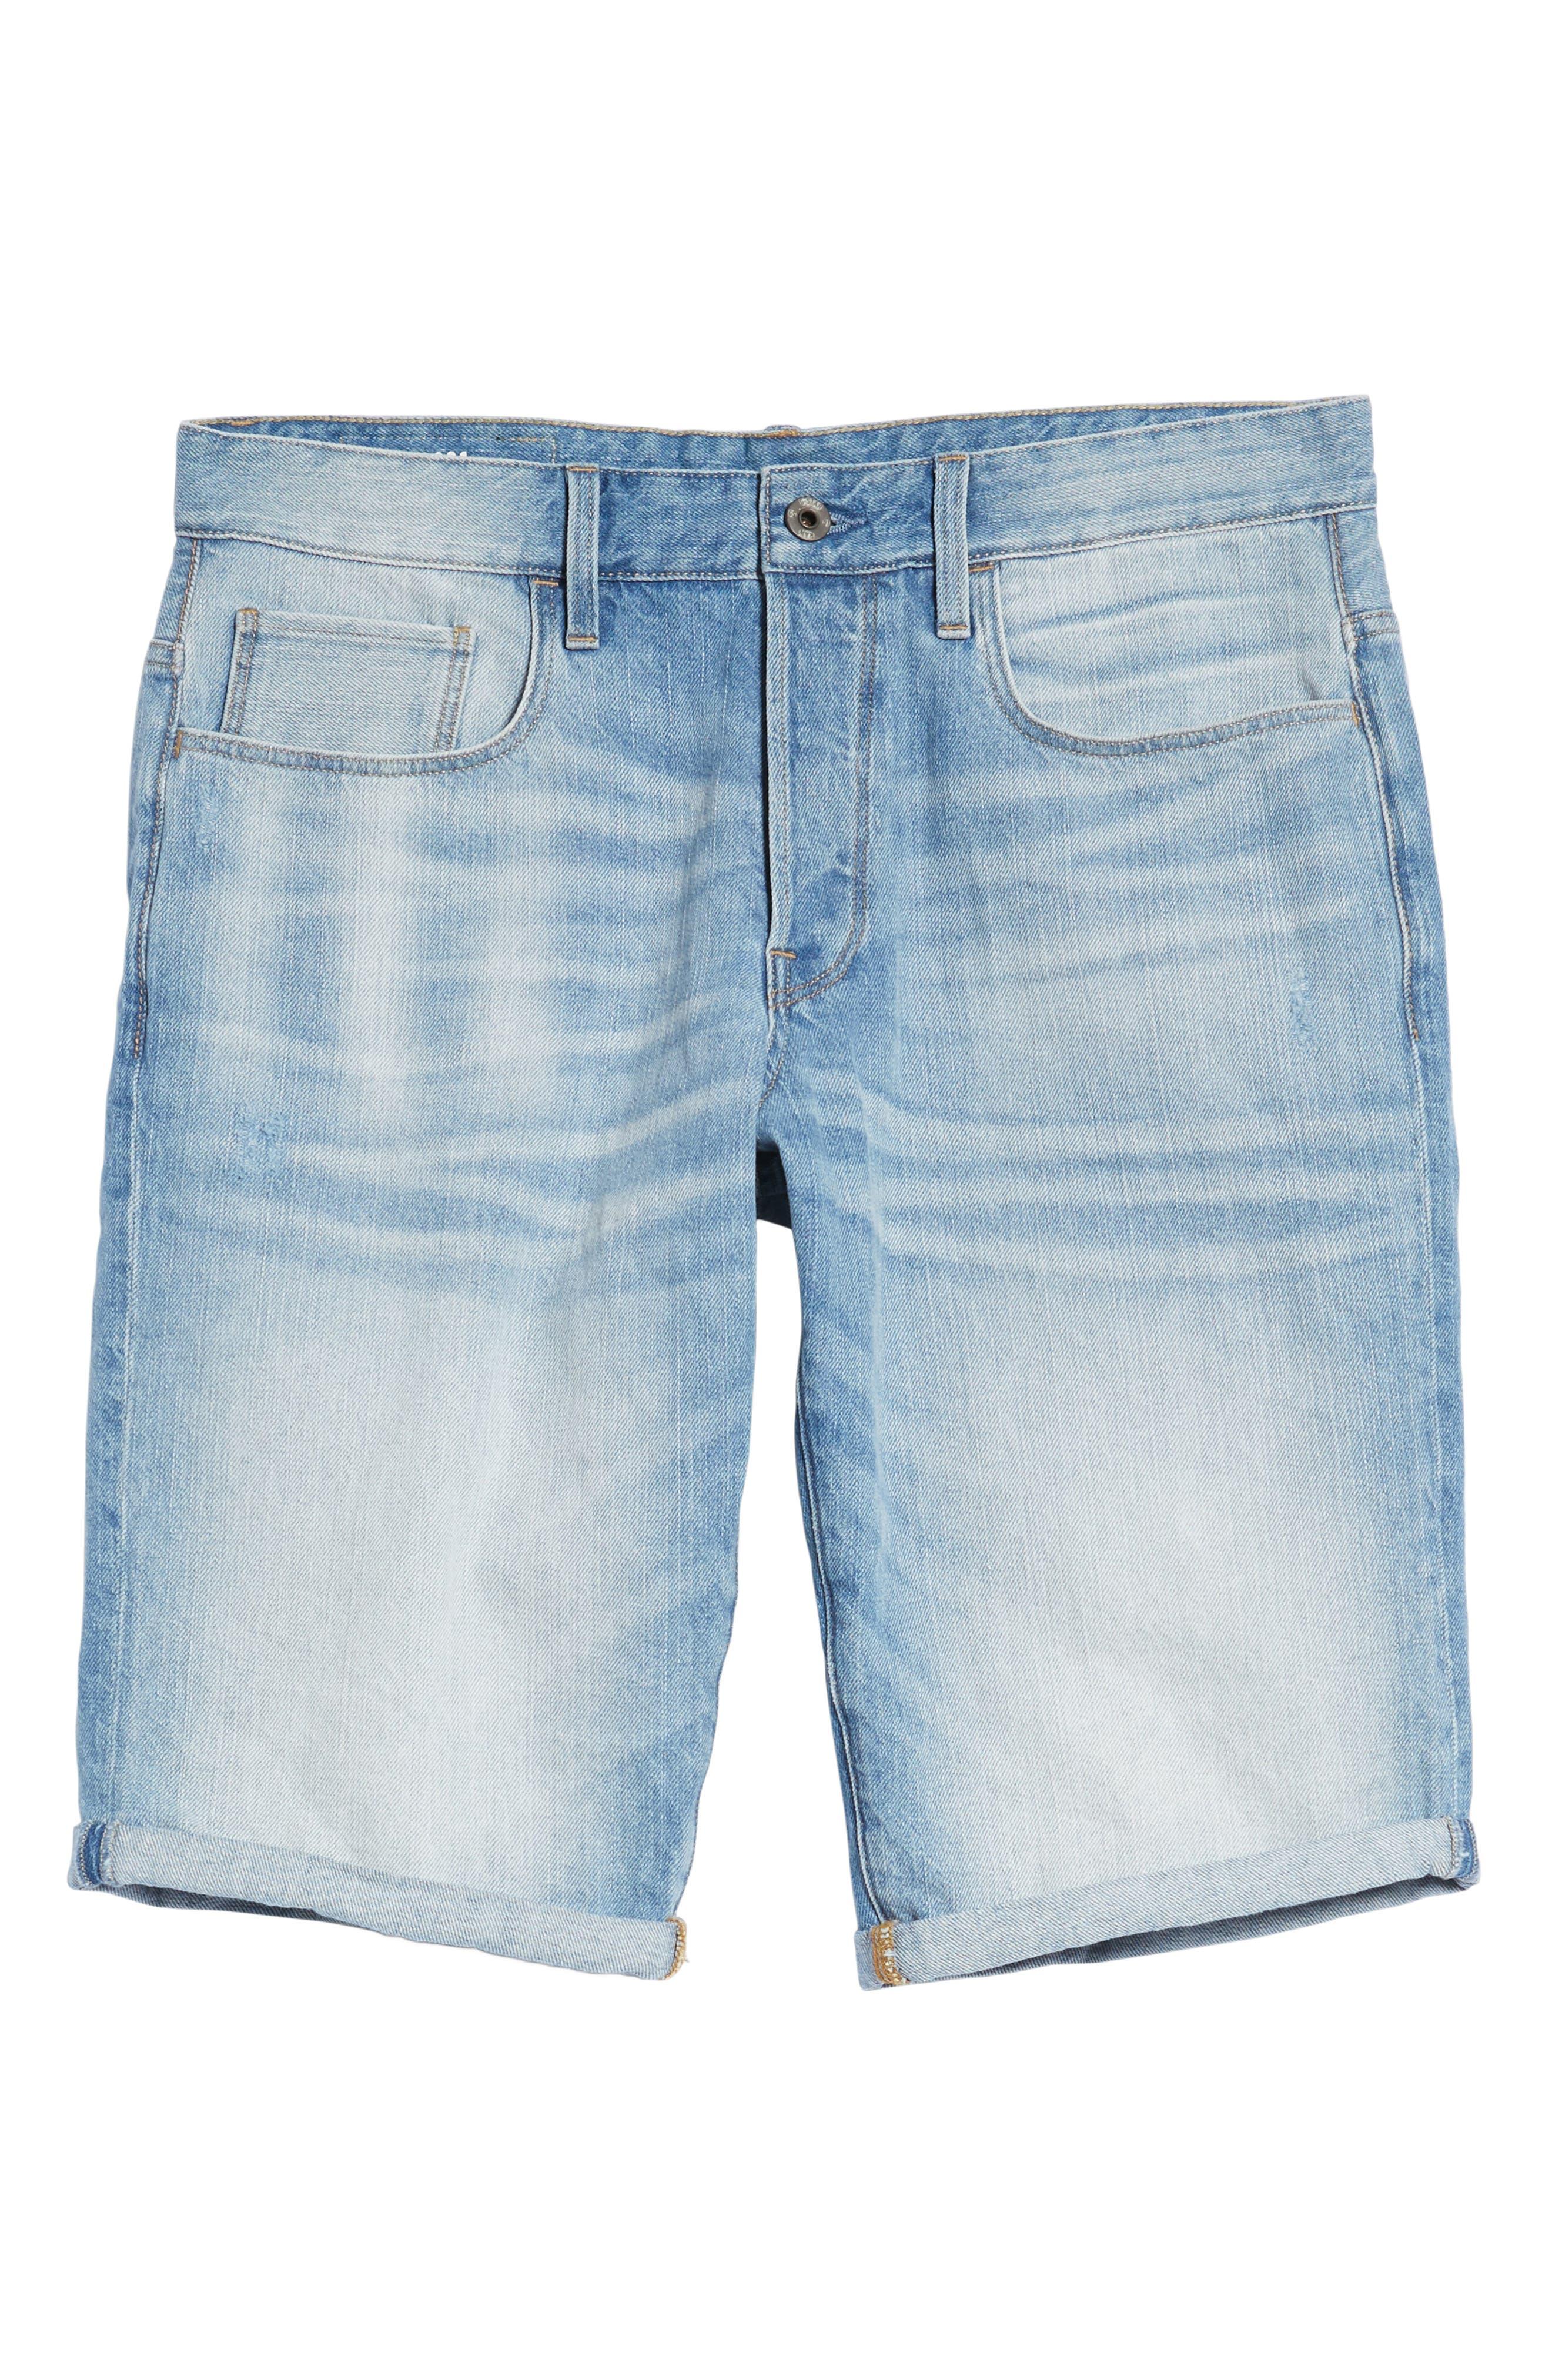 Slim Fit Denim Shorts,                             Alternate thumbnail 5, color,                             Light Aged